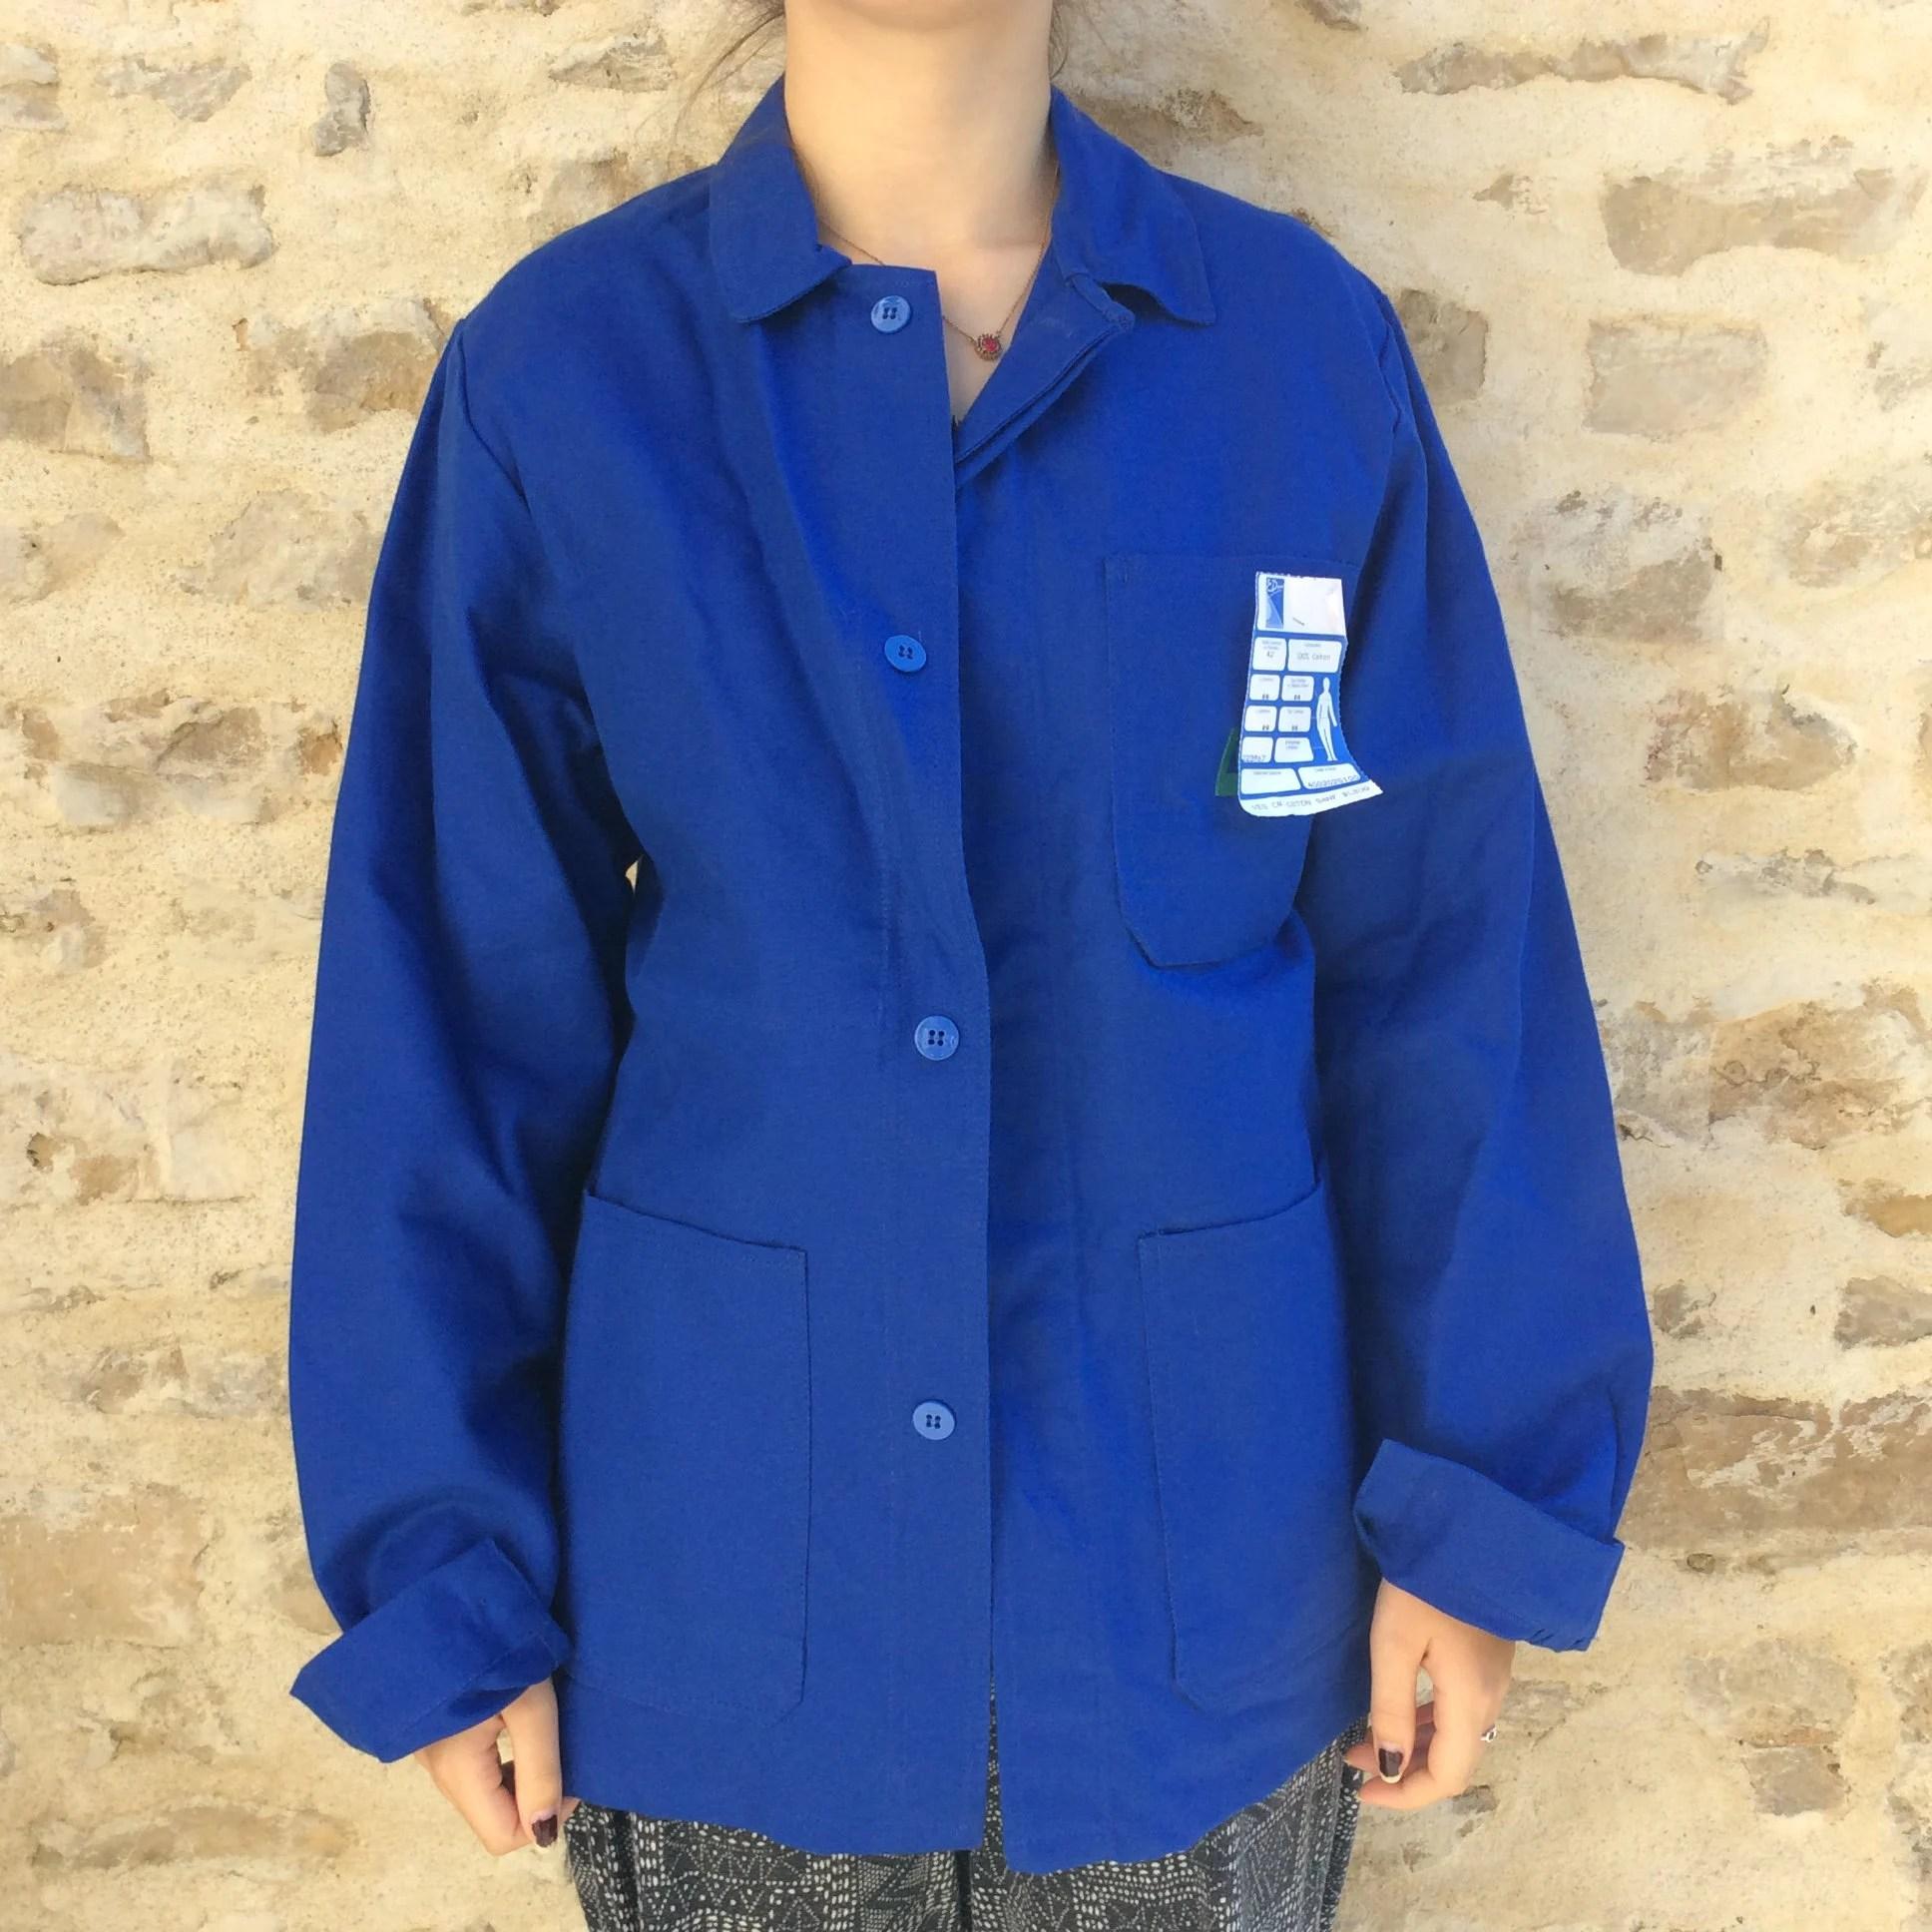 vintage bleu de travail blue work jacket french workwear never worn vintage chore jacket